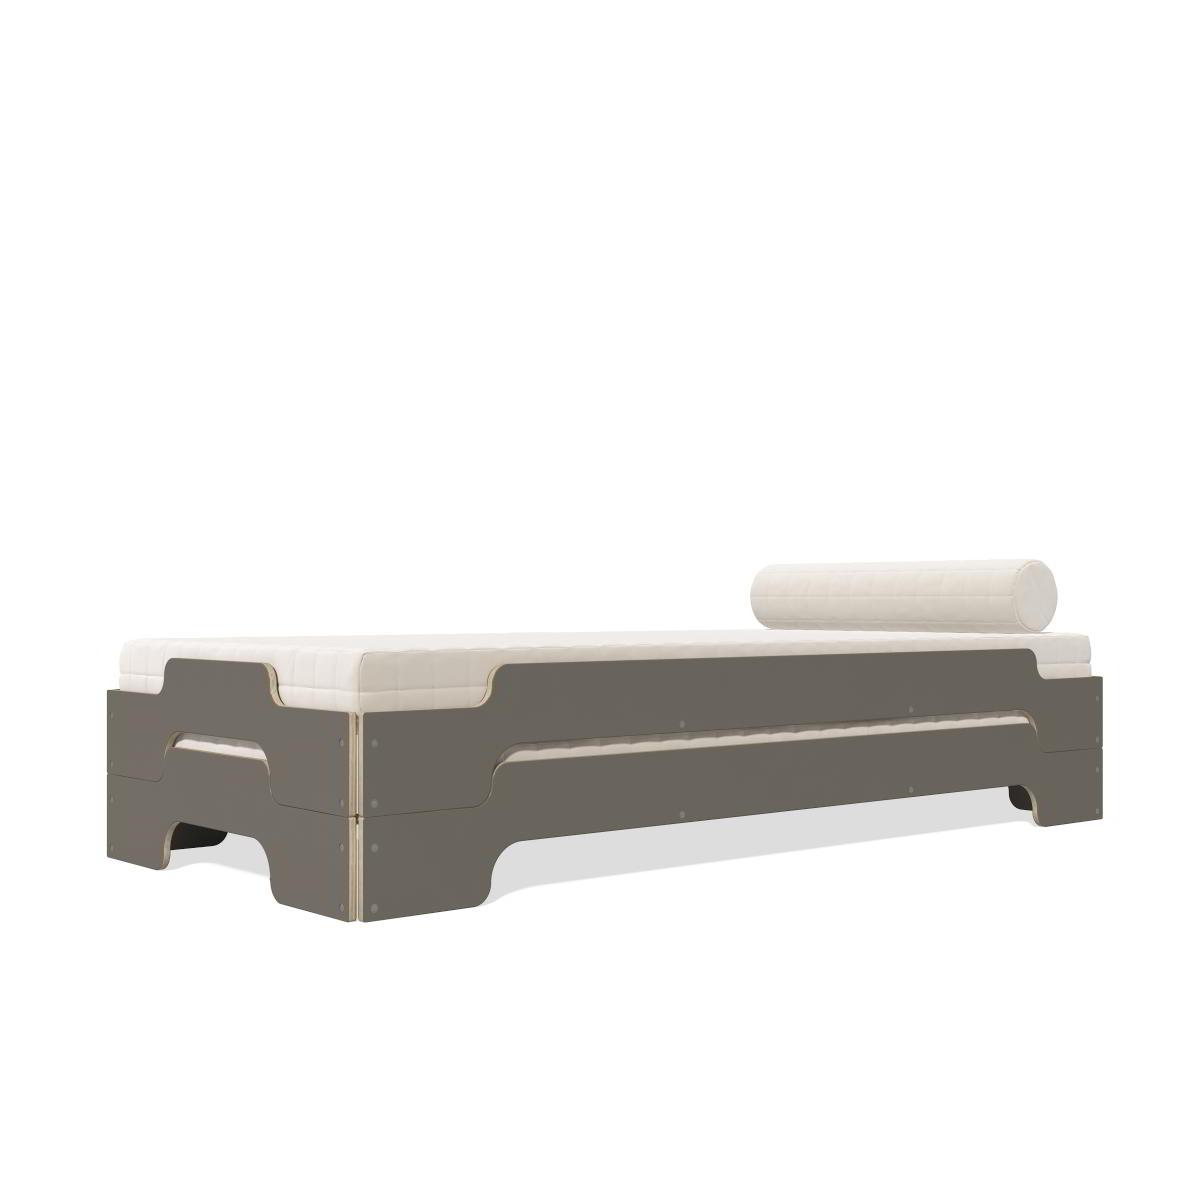 Stapelliege Paketpreis Komforthöhe anthrazit mit Holzkante